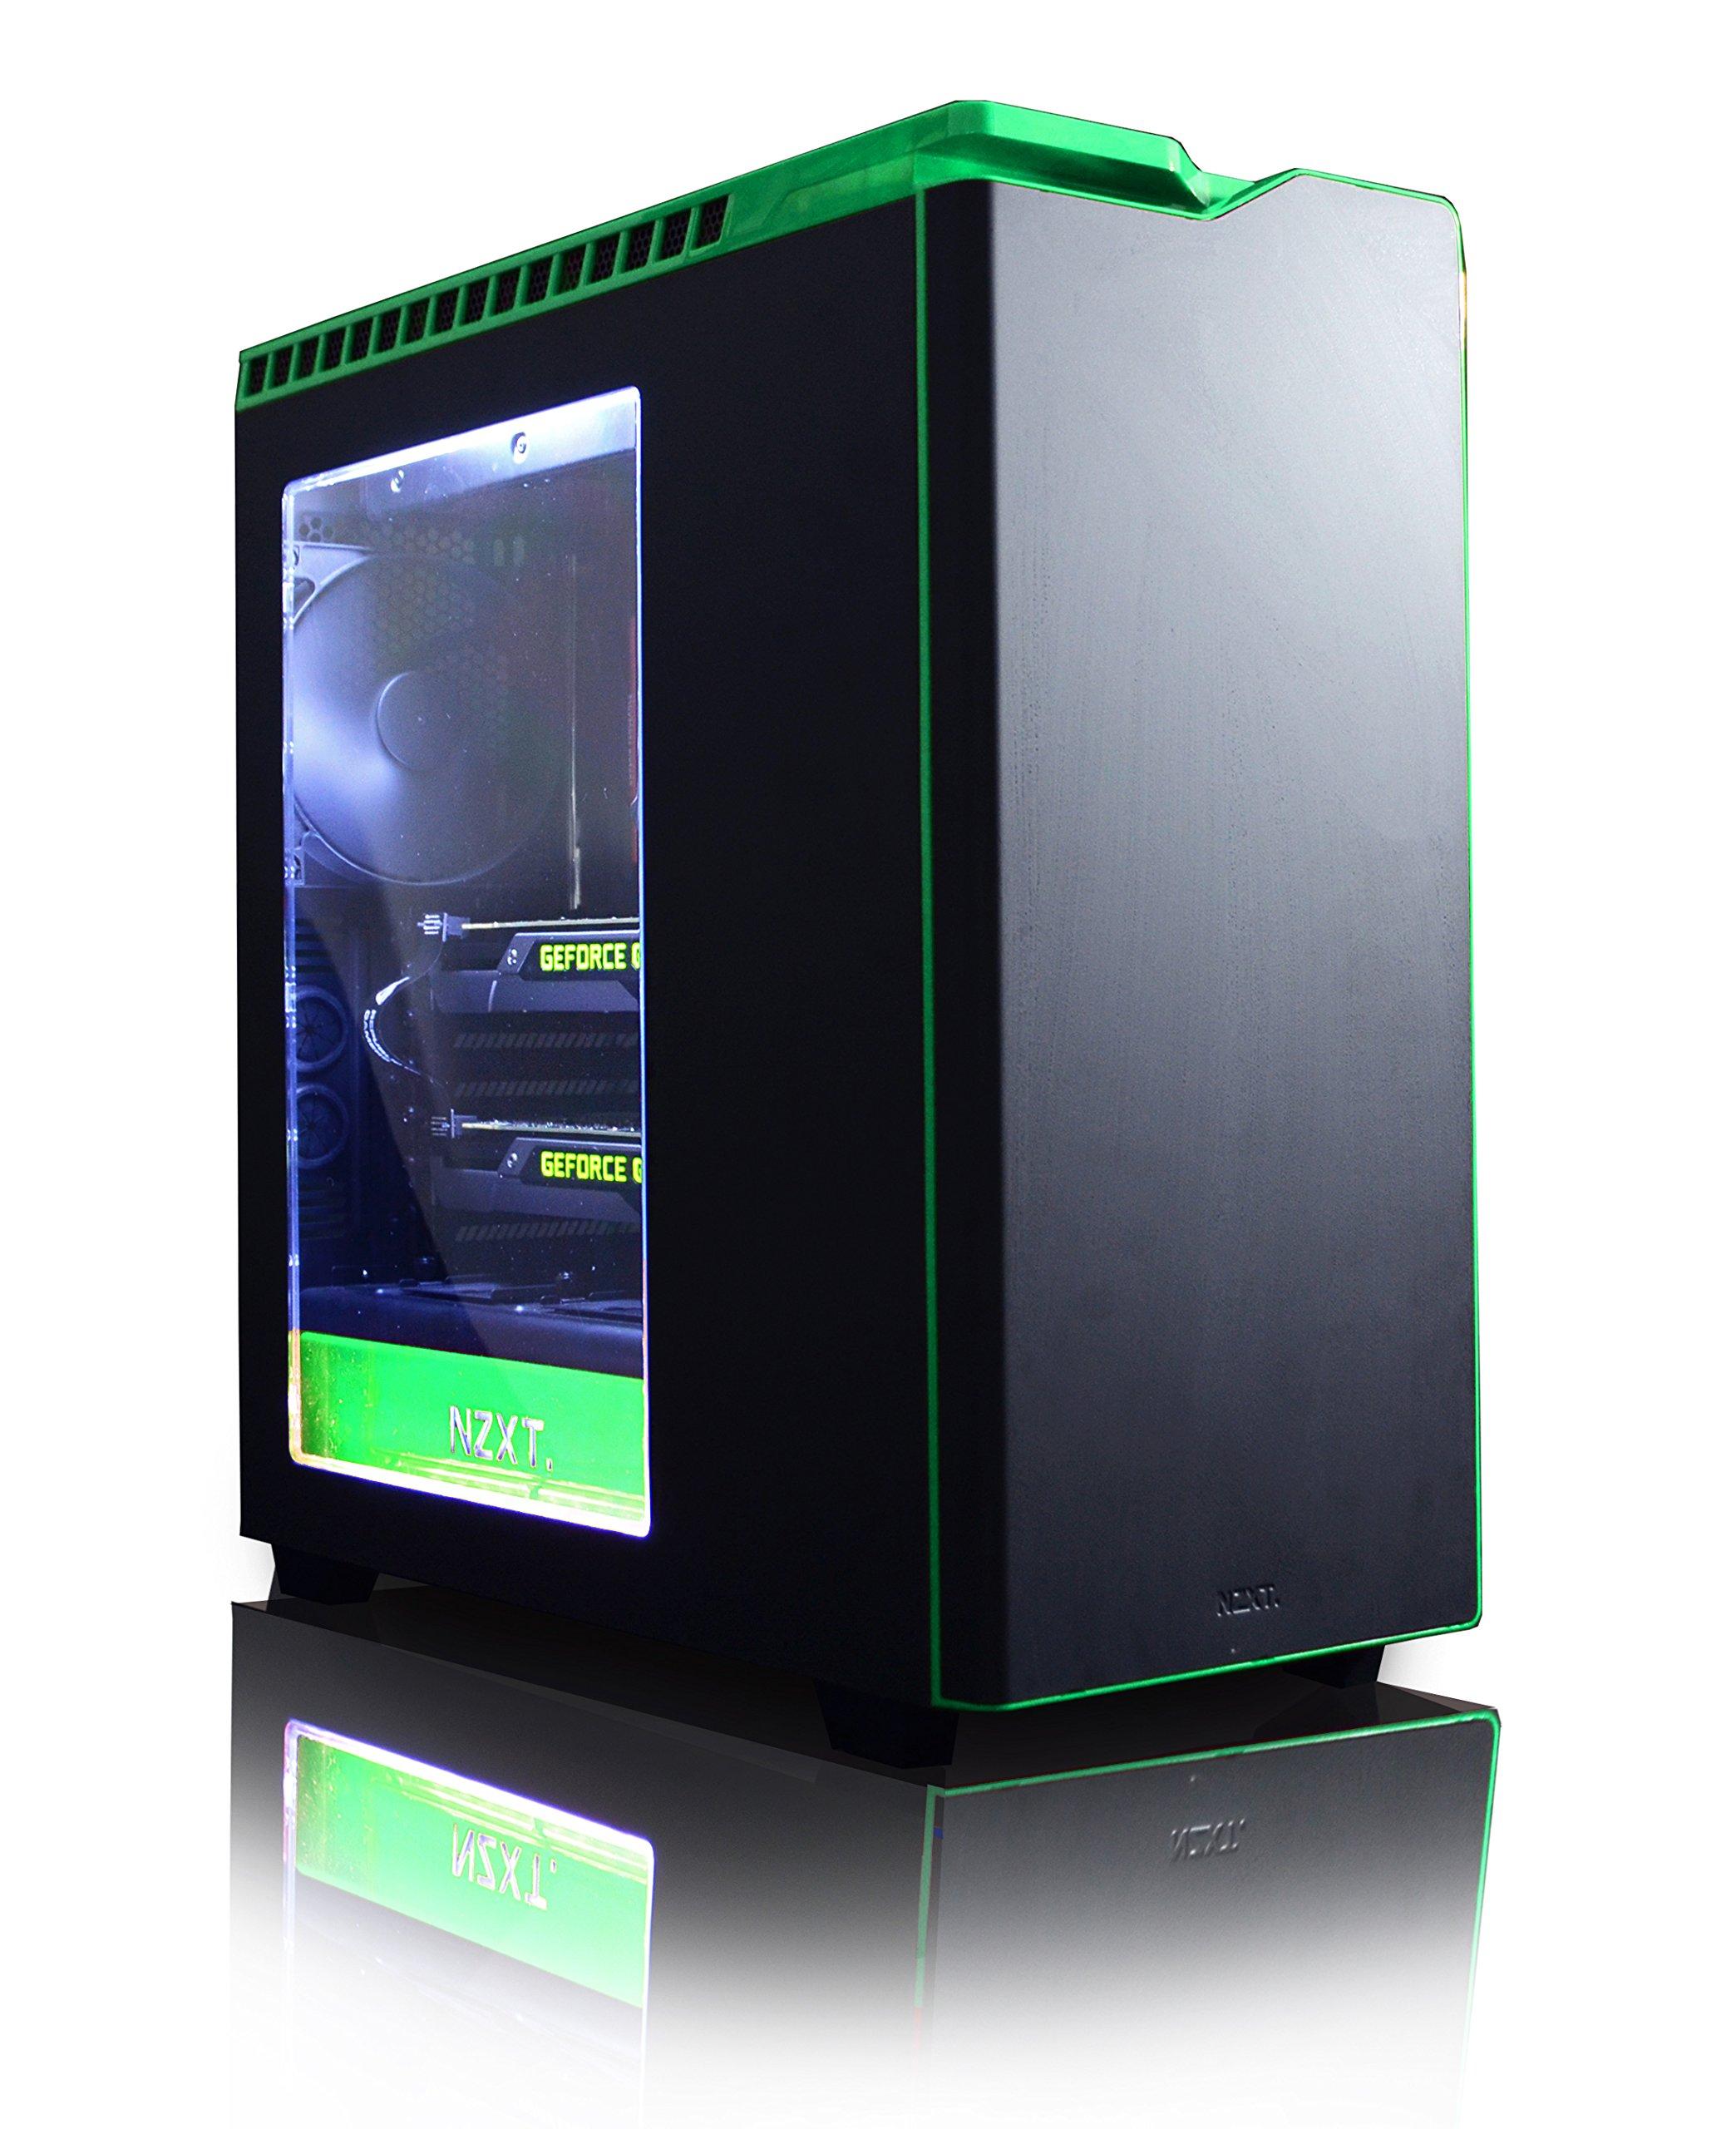 VIBOX Legend 32 Gaming PC Computer mit Spiel Bundle, Windows 10 OS, 27 Zoll HD Monitor (4,5GHz Intel i9 10-Core, 2x Dual…